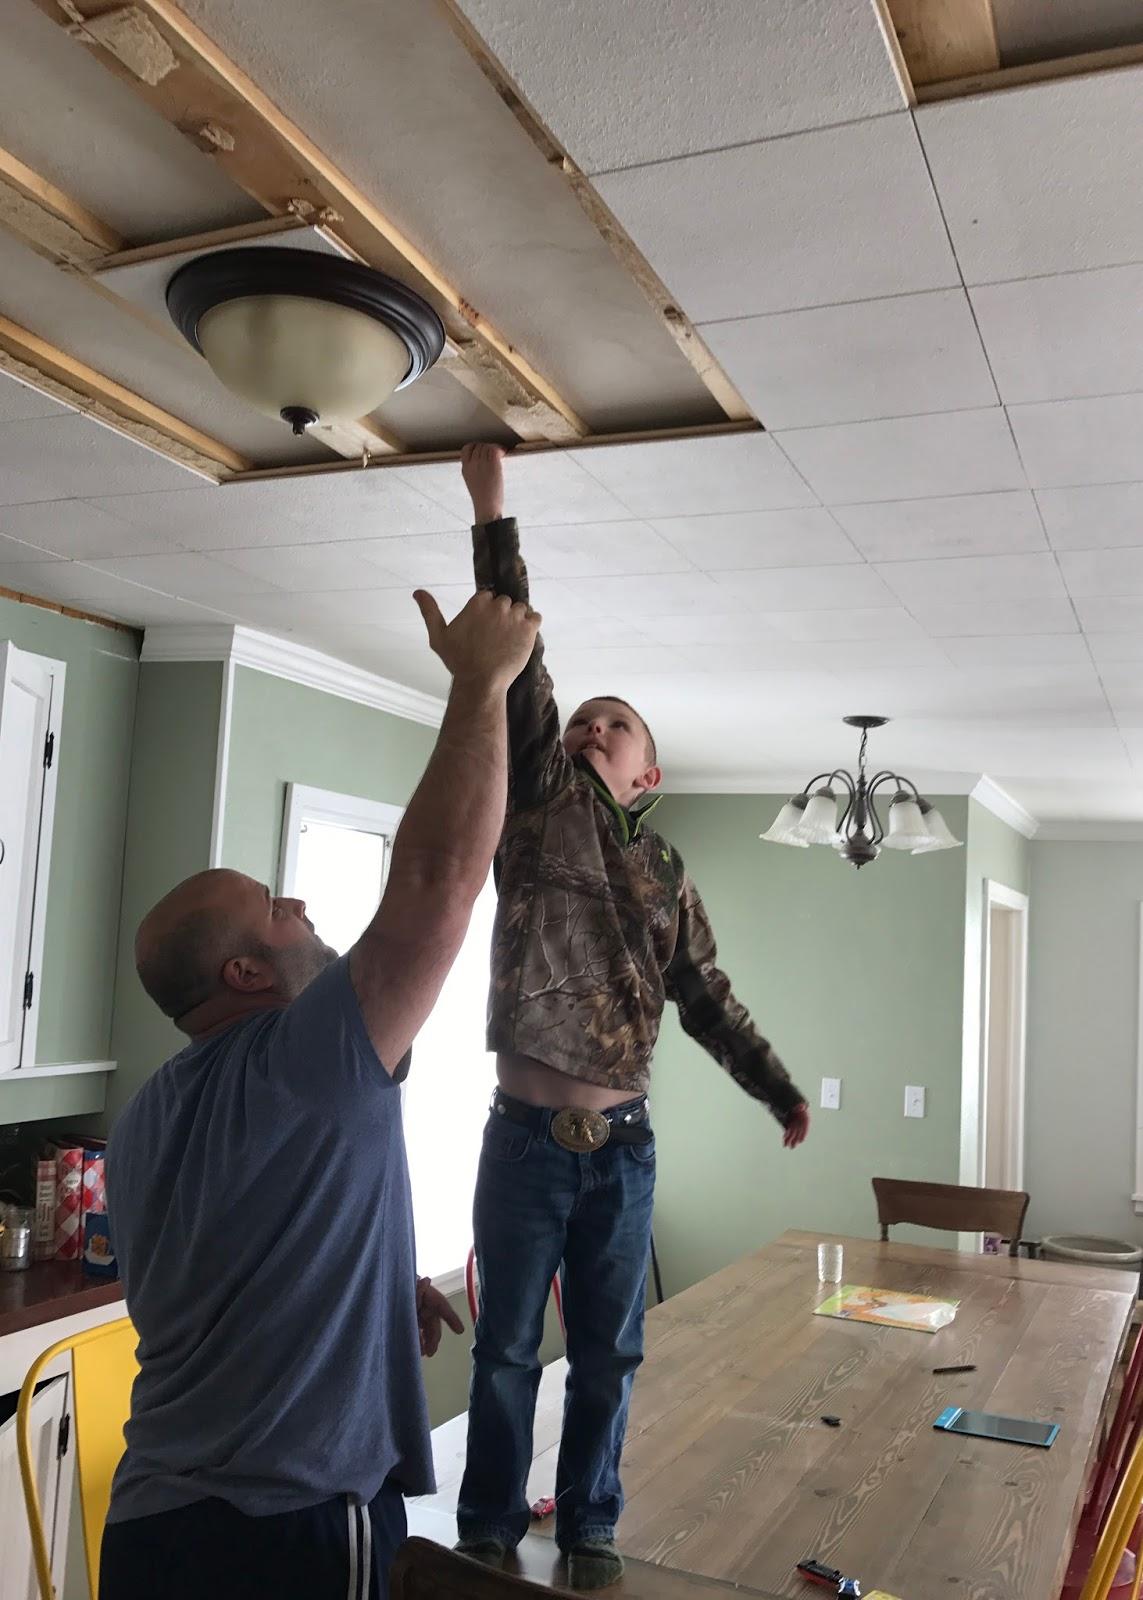 Farmhouse Ceiling - removing ceiling tiles | Averie Lane: Farmhouse ...